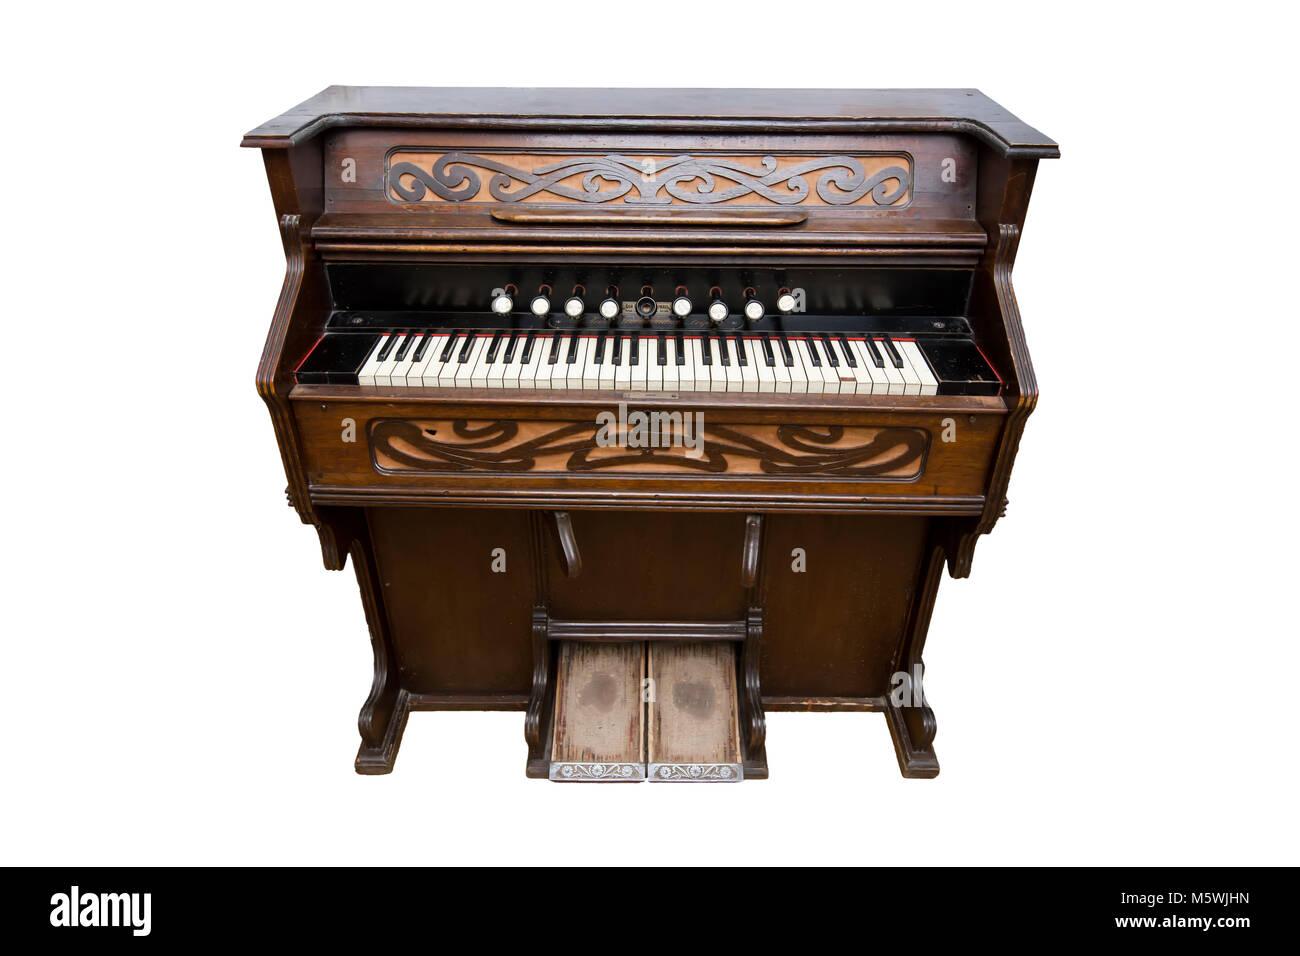 Harmonium. Pump organ, isolated on white. Status old - Stock Image